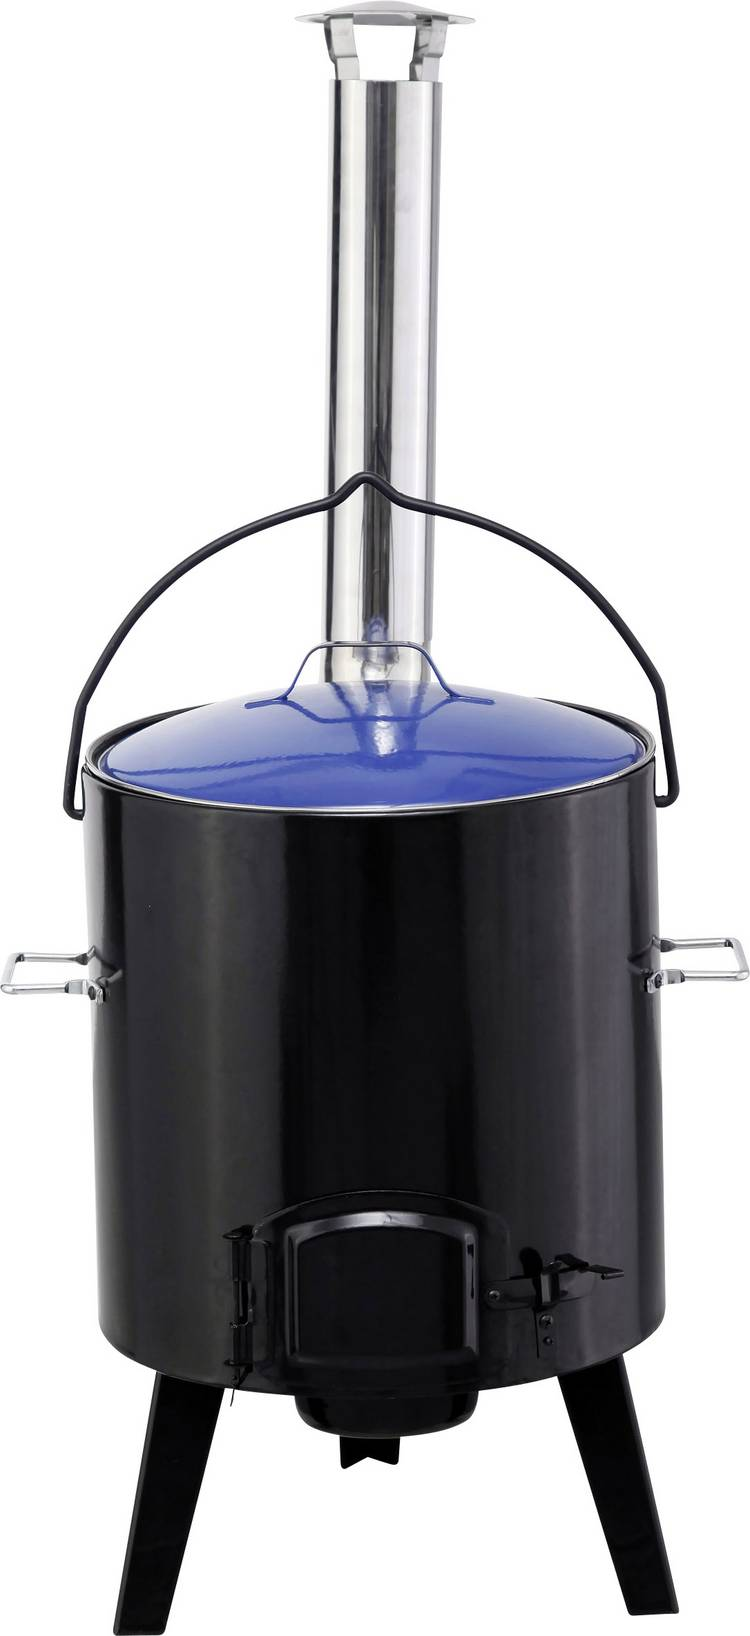 Image of Barbecue tepro Garten Waverly Stoof Zwart-blauw